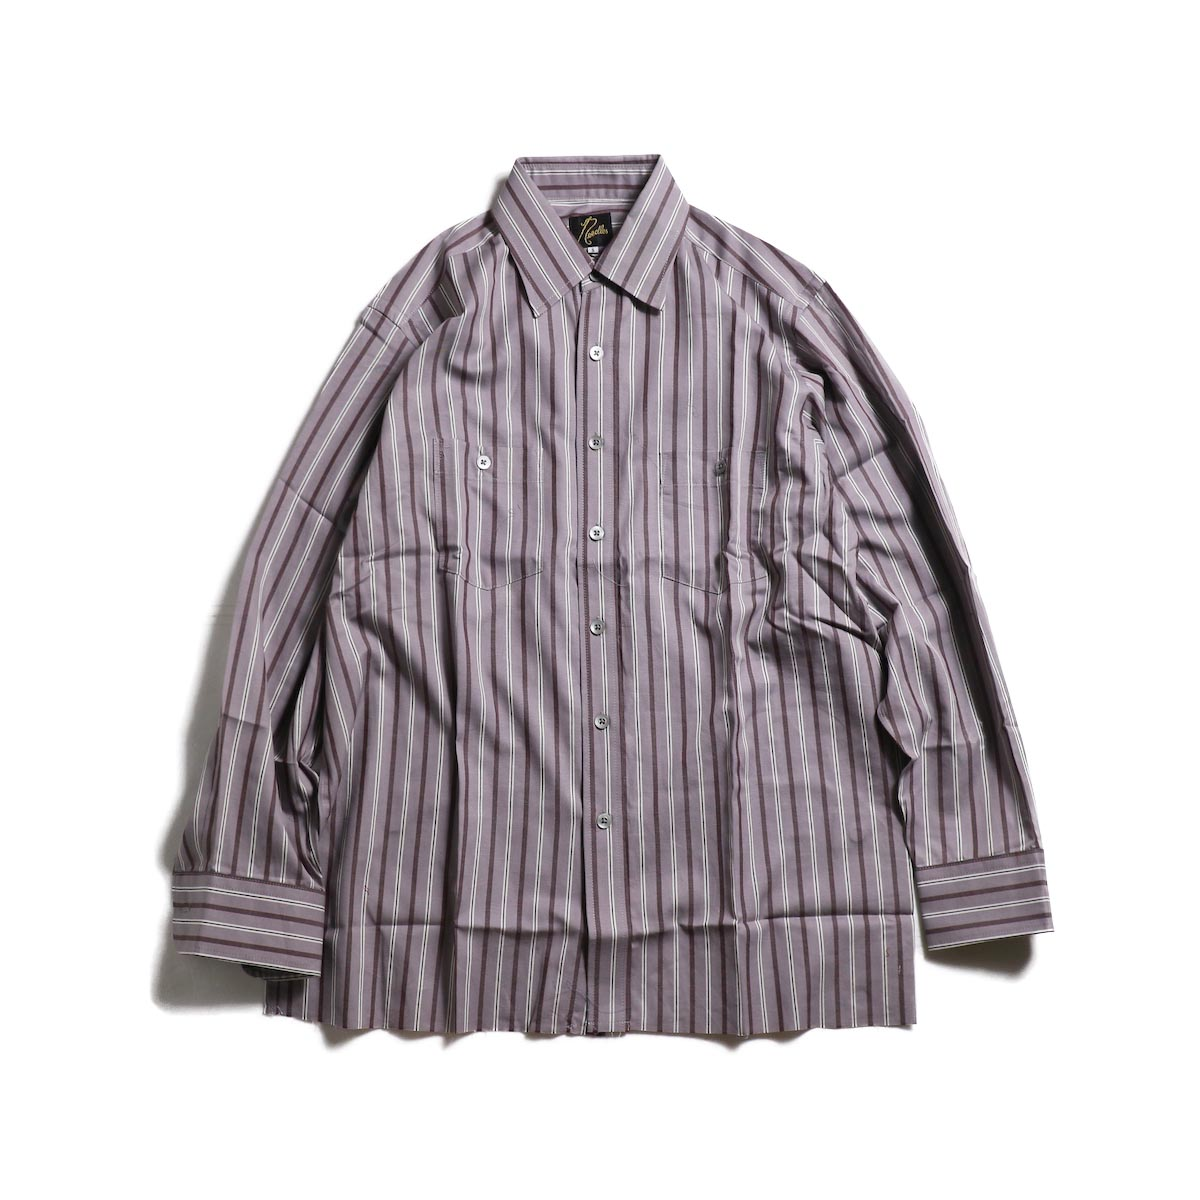 Needles / Cut-Off Bottom Regular Collar Shirt -Cotton Twill Stripe (Gray)